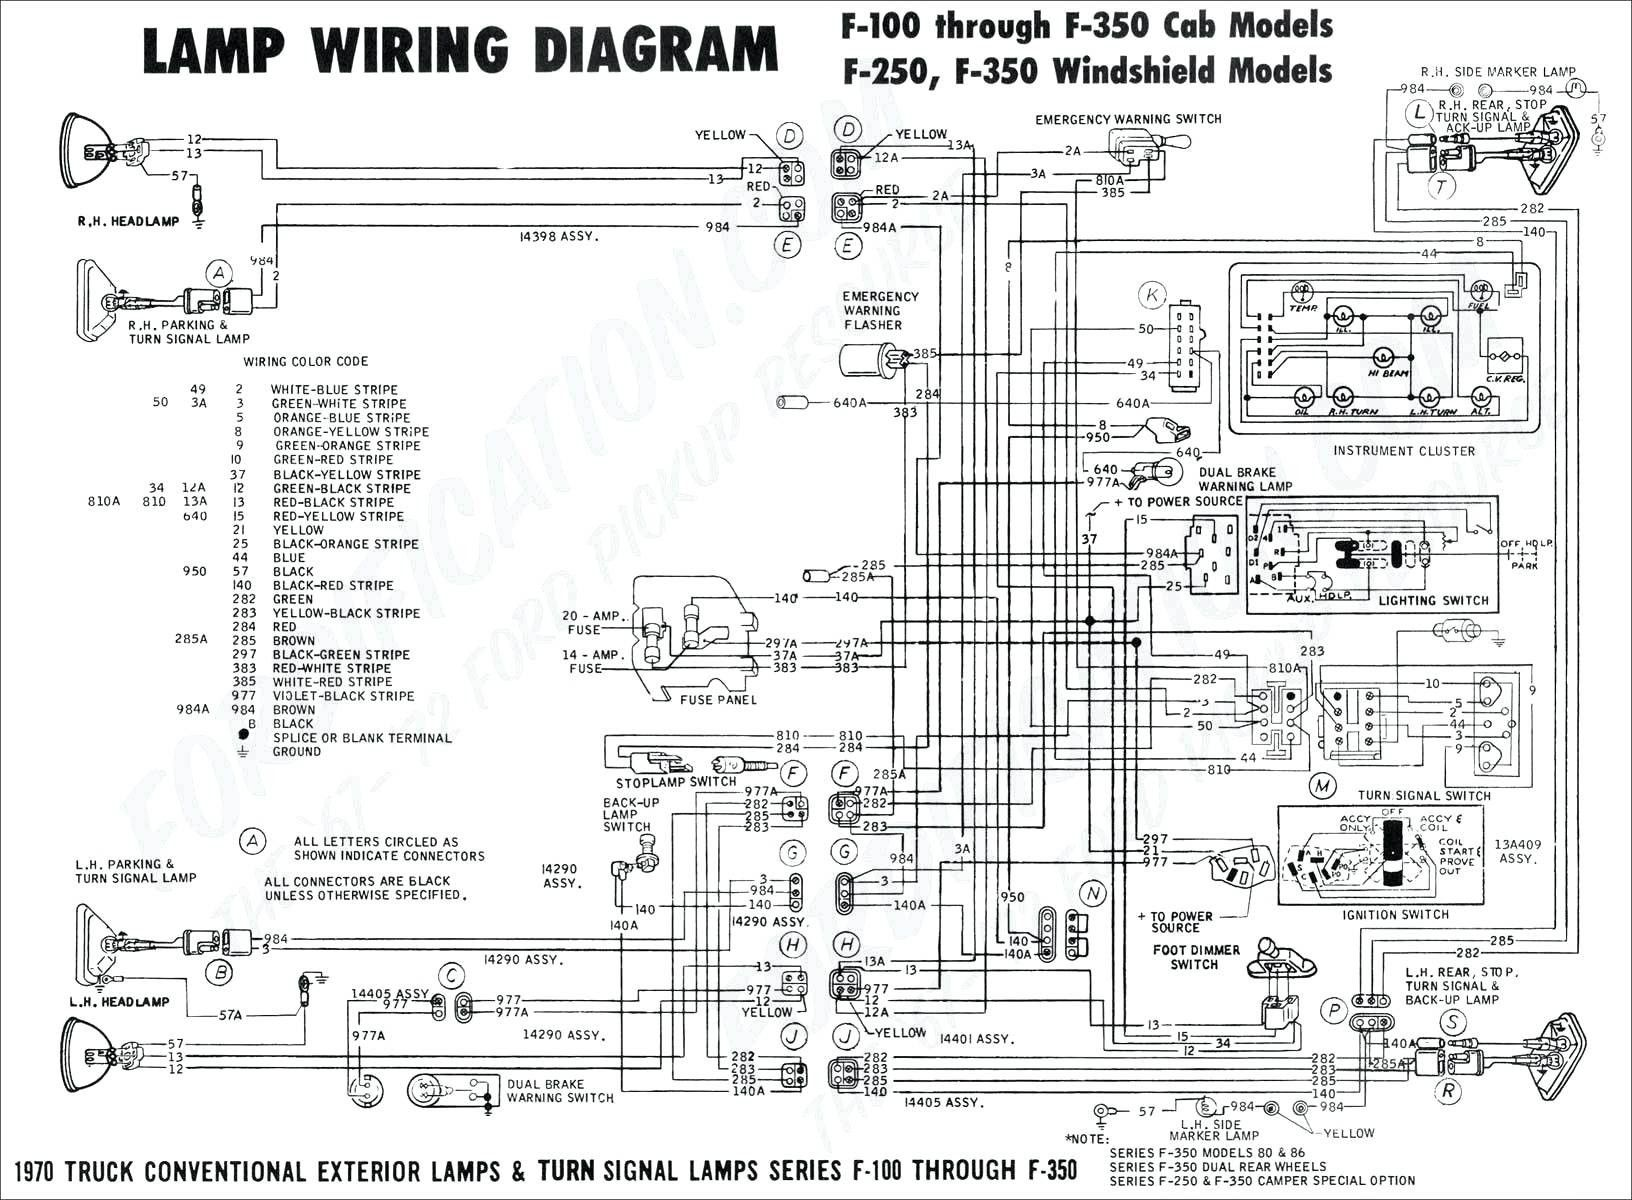 2004 Ram 2500 Wiring Diagram New In 2020 Electrical Wiring Diagram Trailer Wiring Diagram Diagram